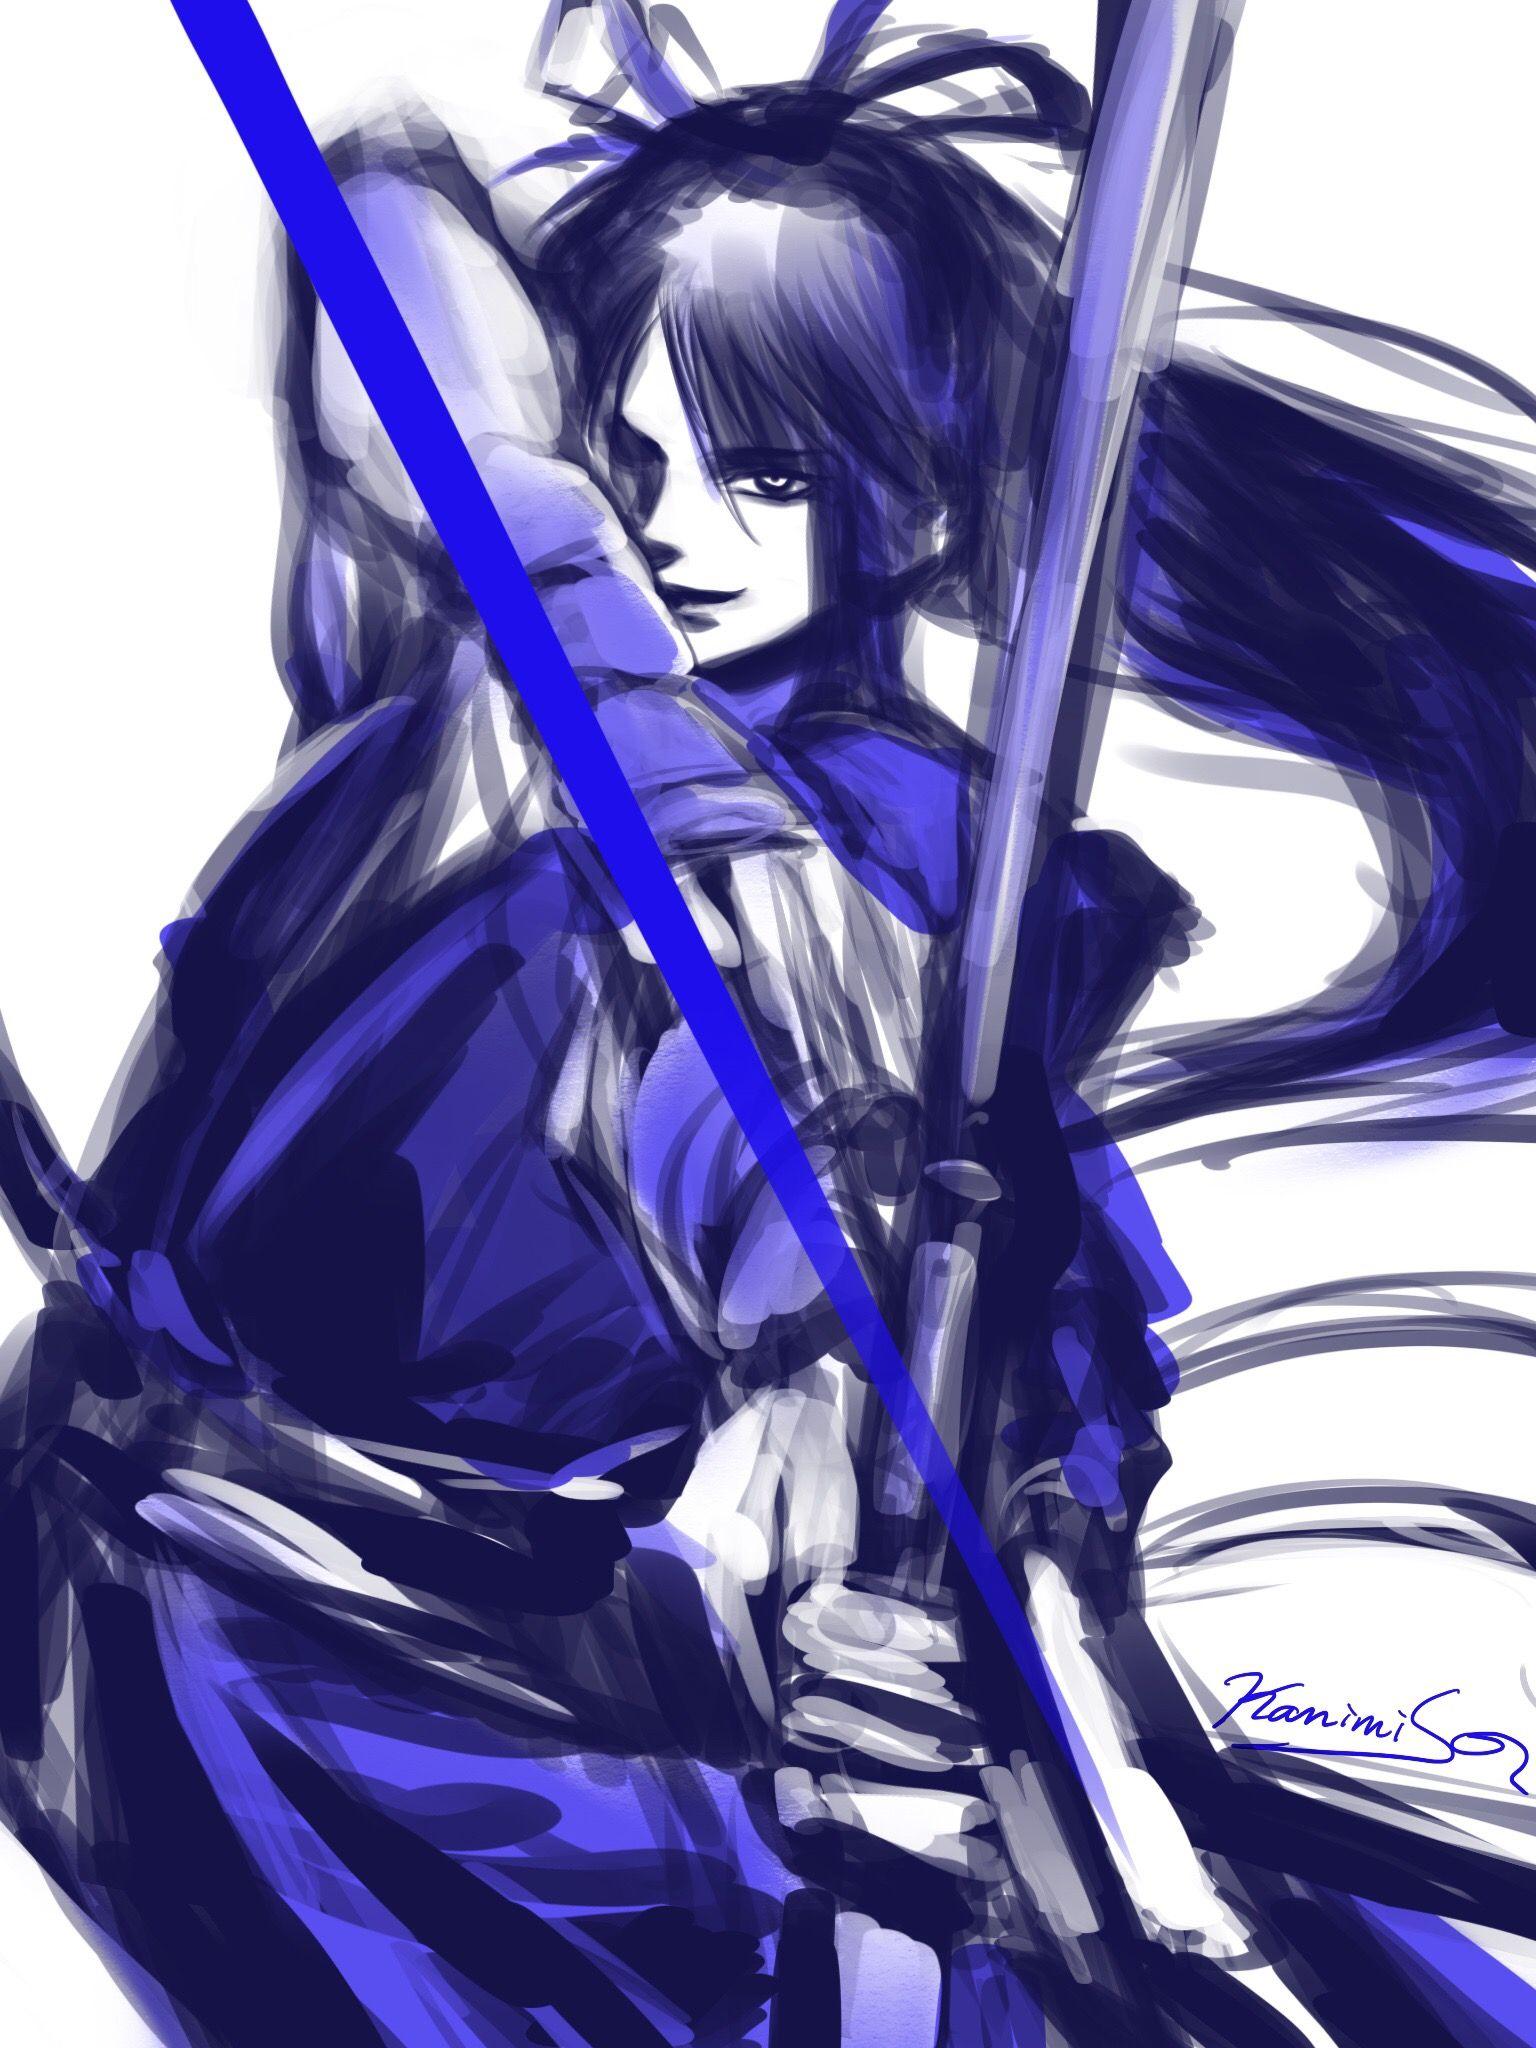 Yoichi Drifters Samurai Anime Drifter Anime